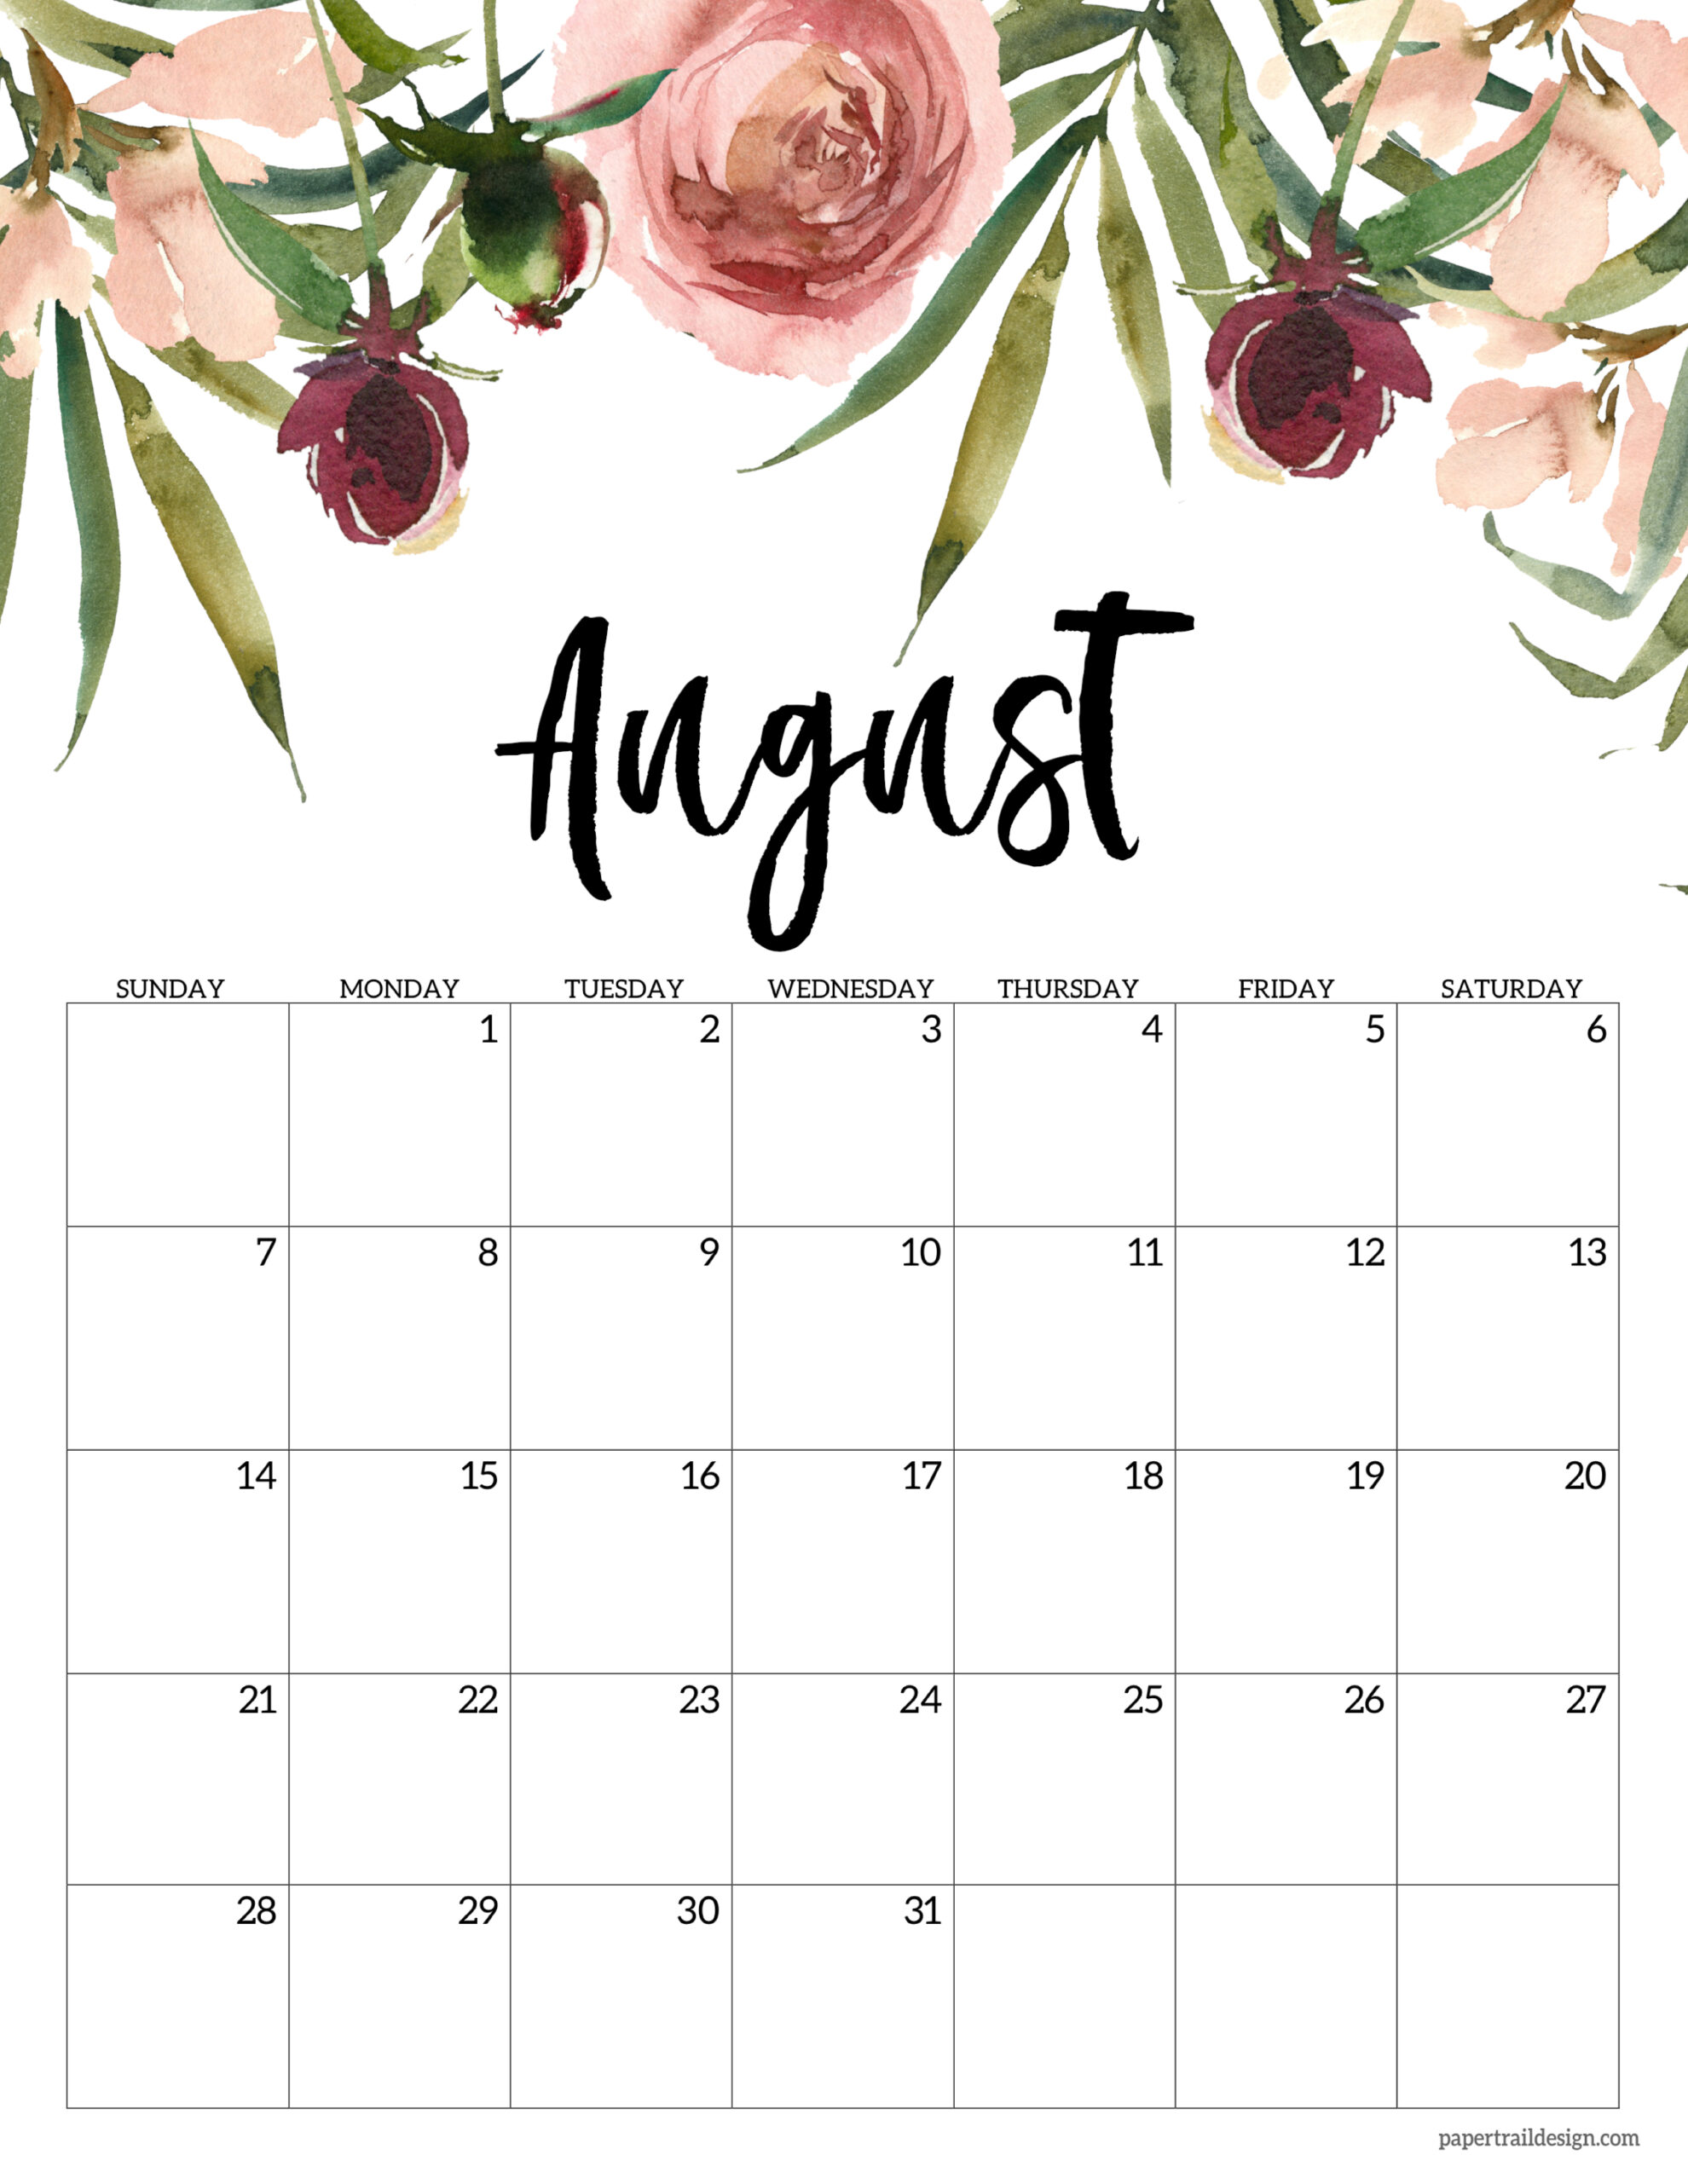 August Printable Calendar 2022.Free 2022 Calendar Printable Floral Paper Trail Design